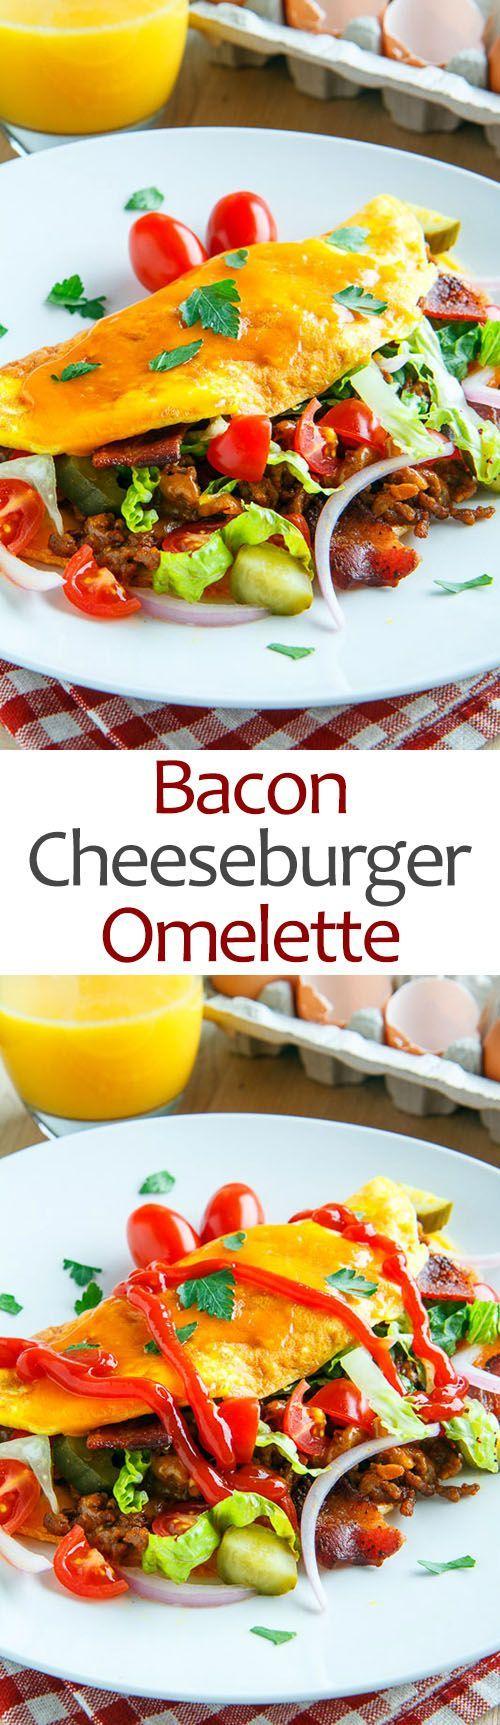 Bacon Cheeseburger Omelette